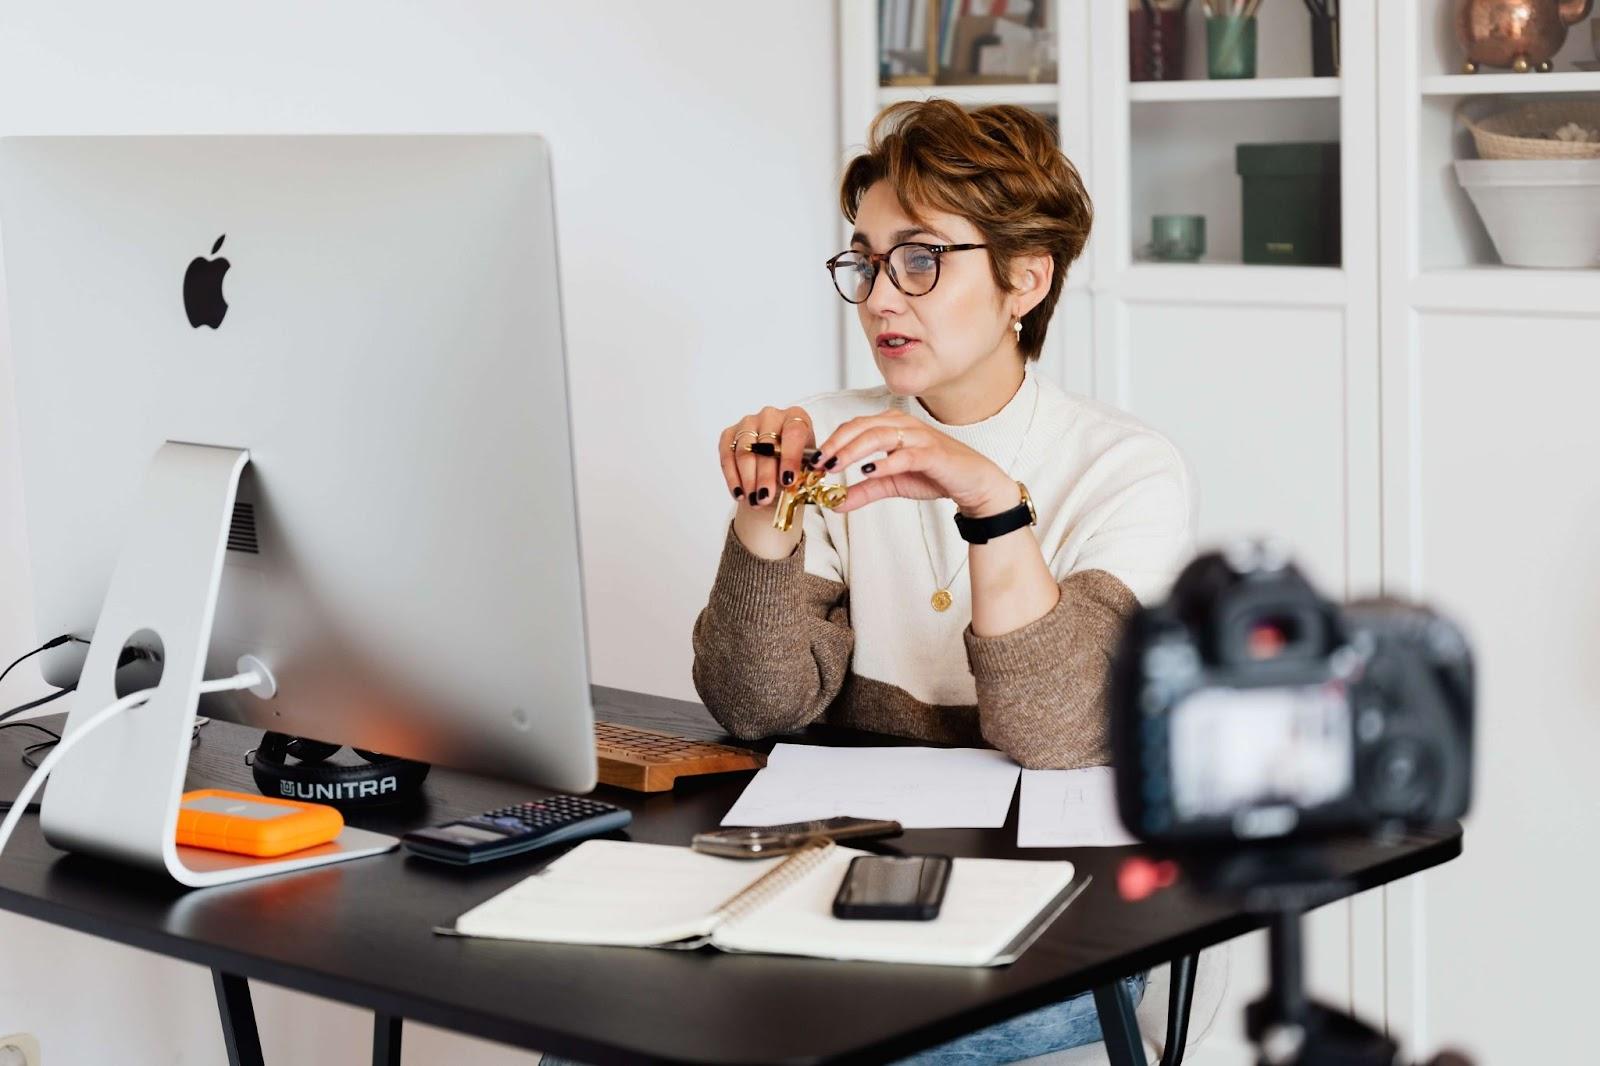 Filming training video